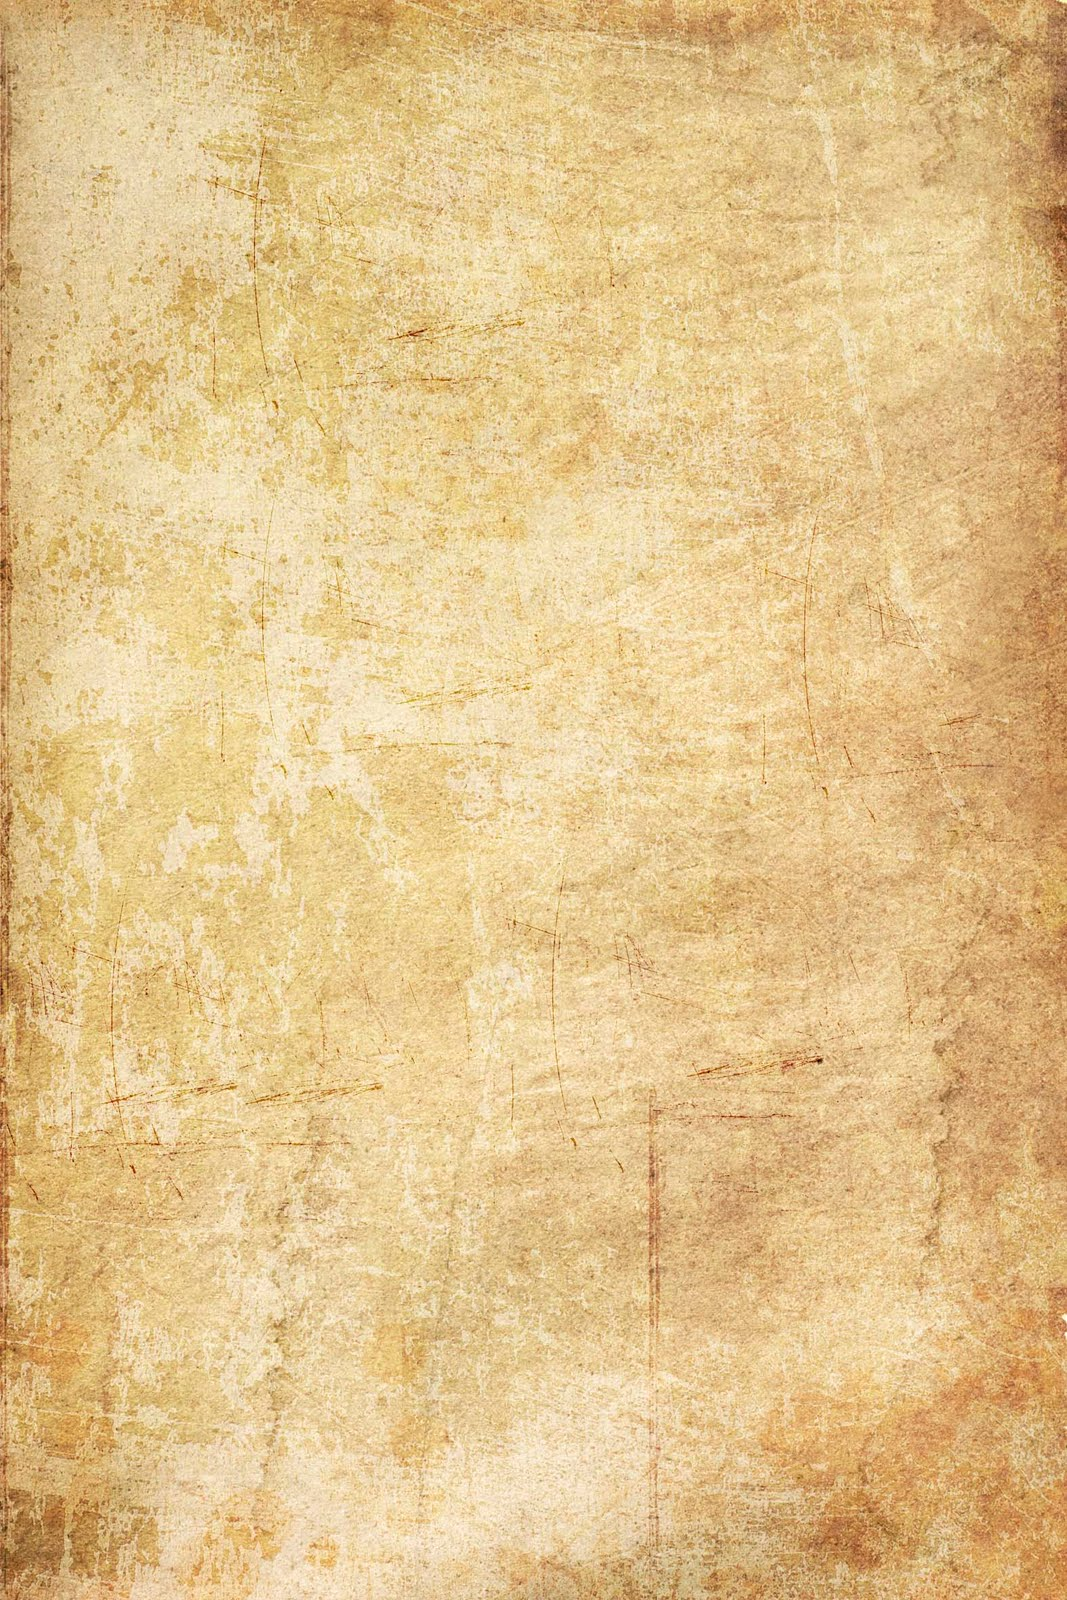 Blog blog blog efectos photoshop - Papel pared antiguo ...